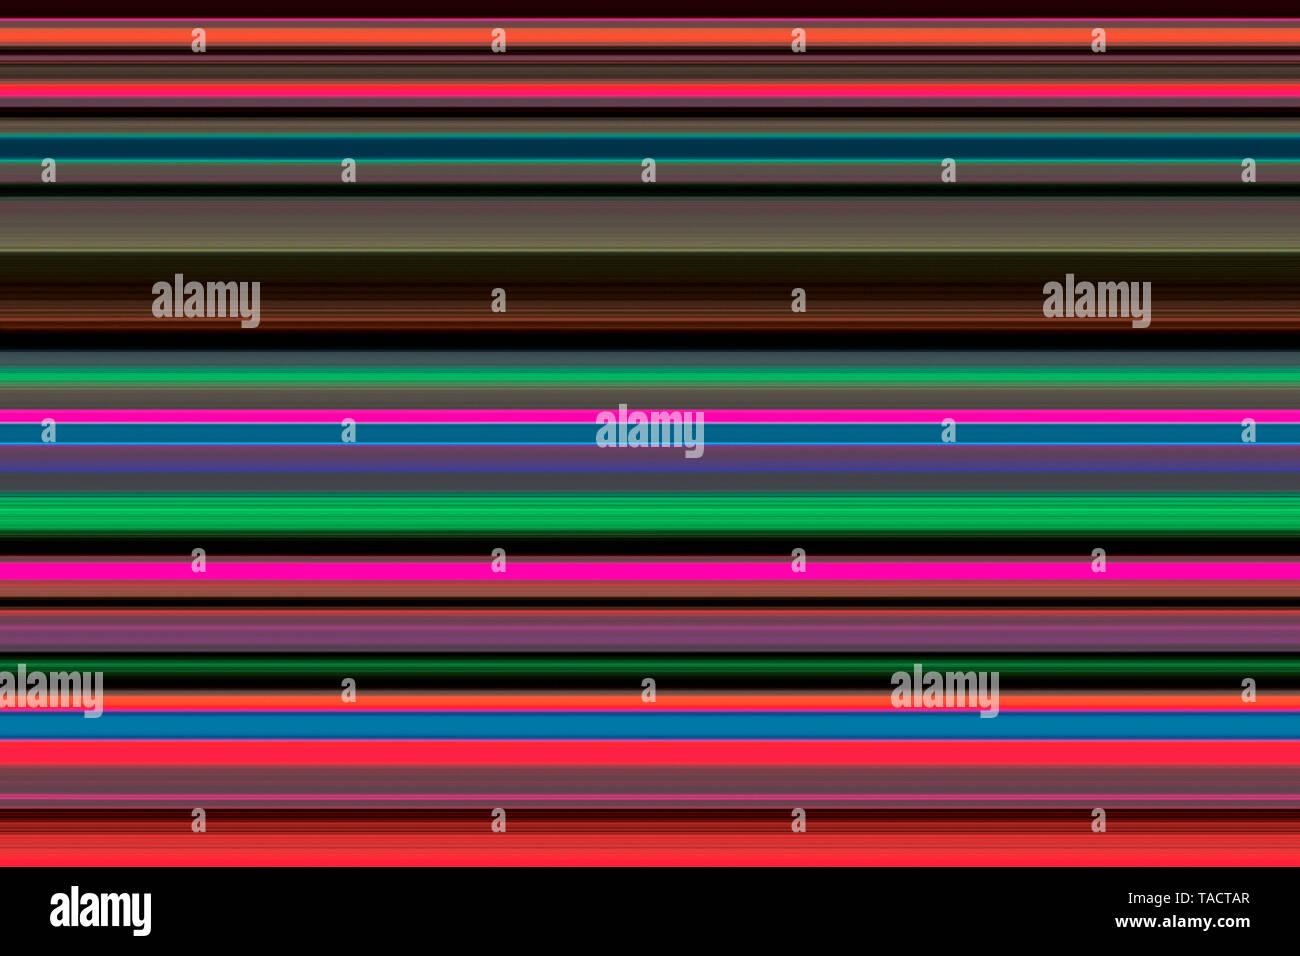 Modern fine art computer digital paintings creative hypnotist imagination colourful line vhm 12/11/2014. - Stock Image